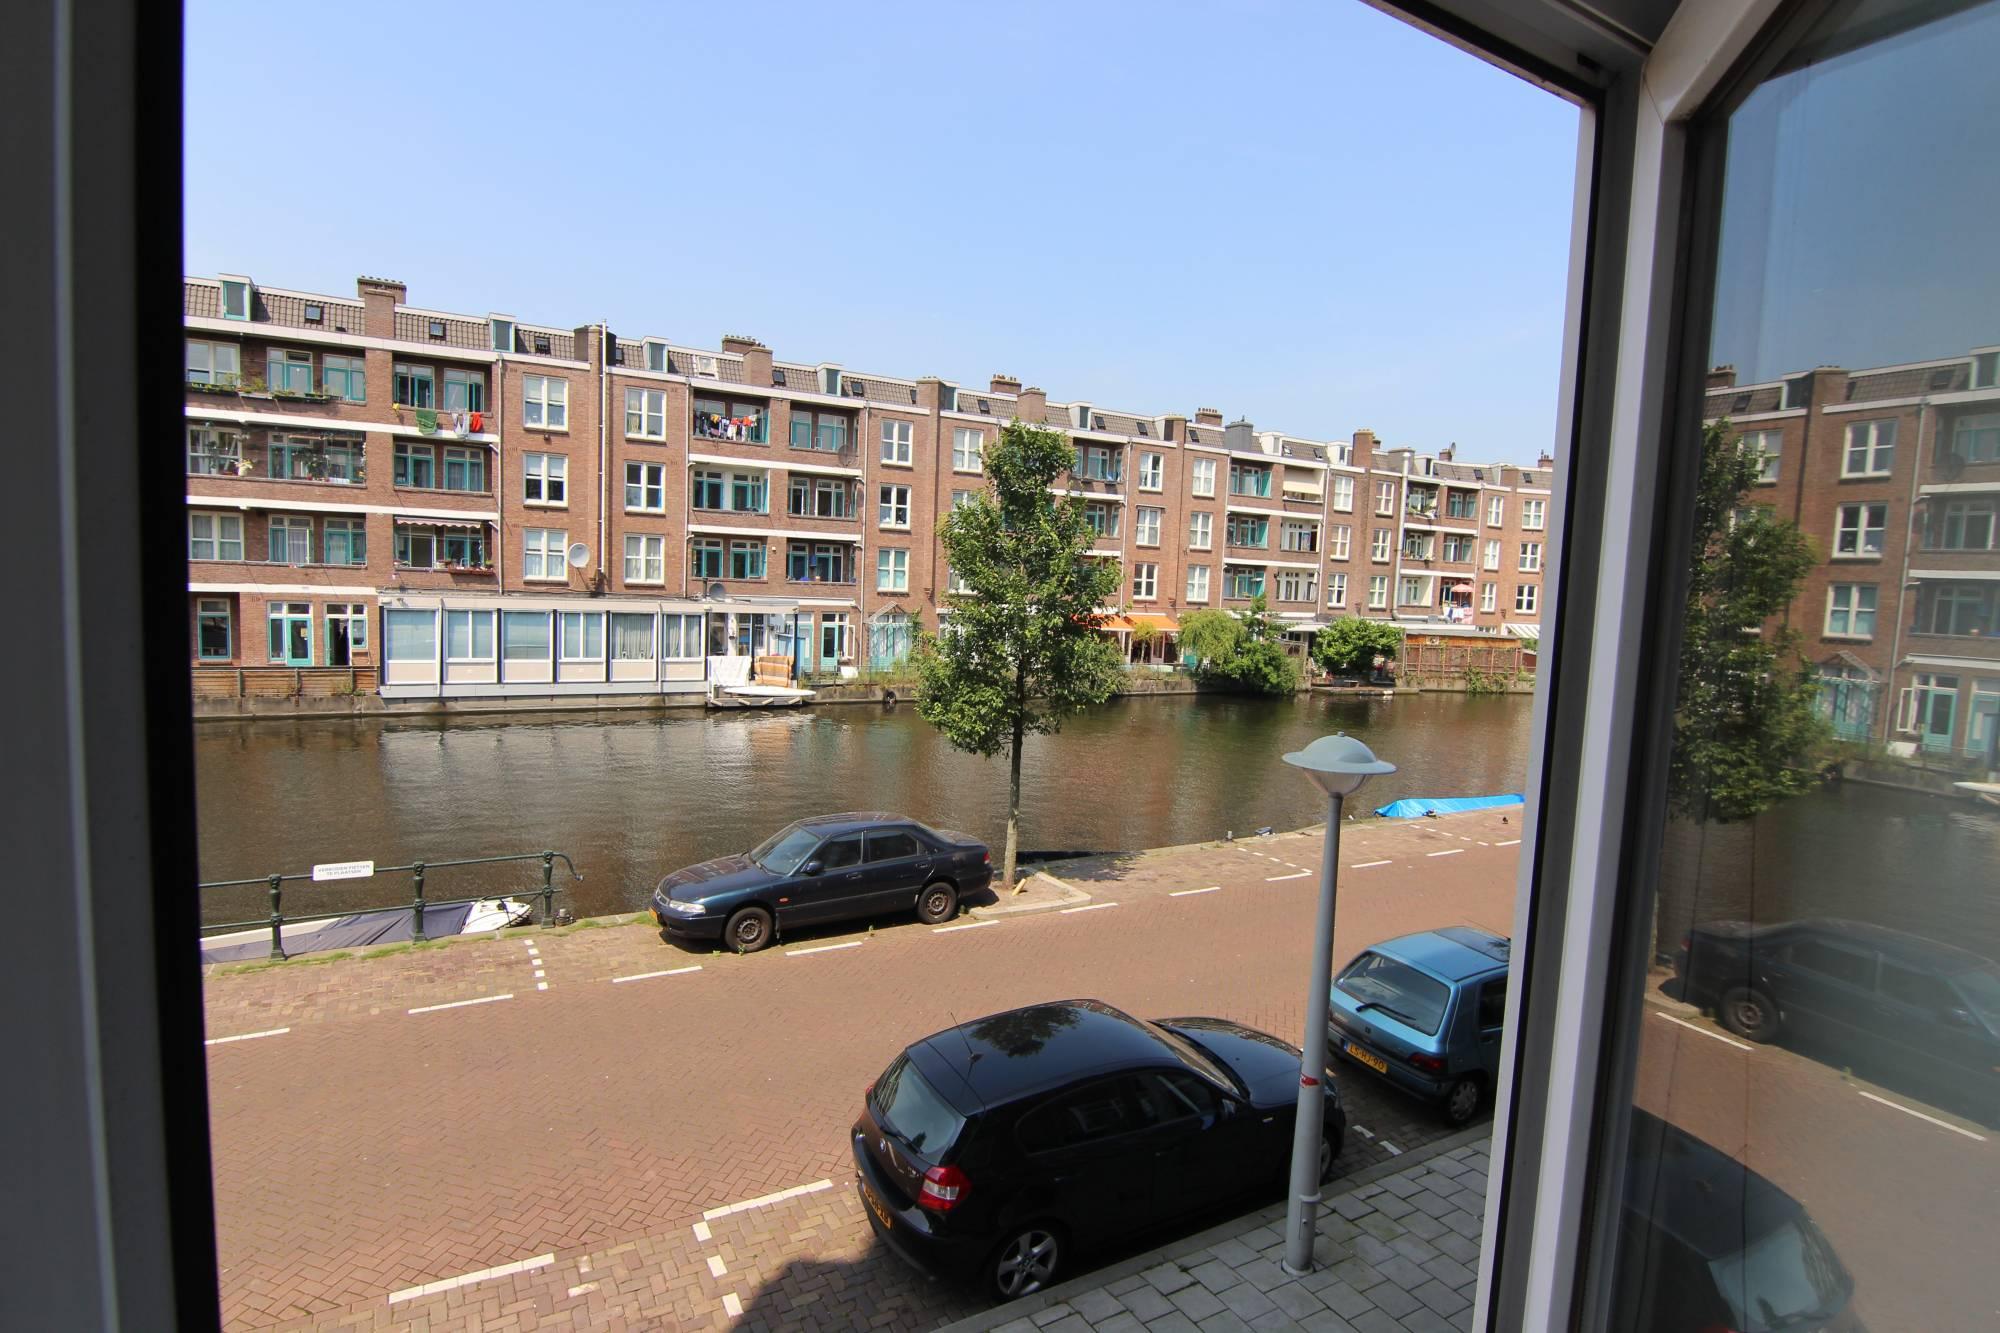 Crynssenstraat / Amsterdam